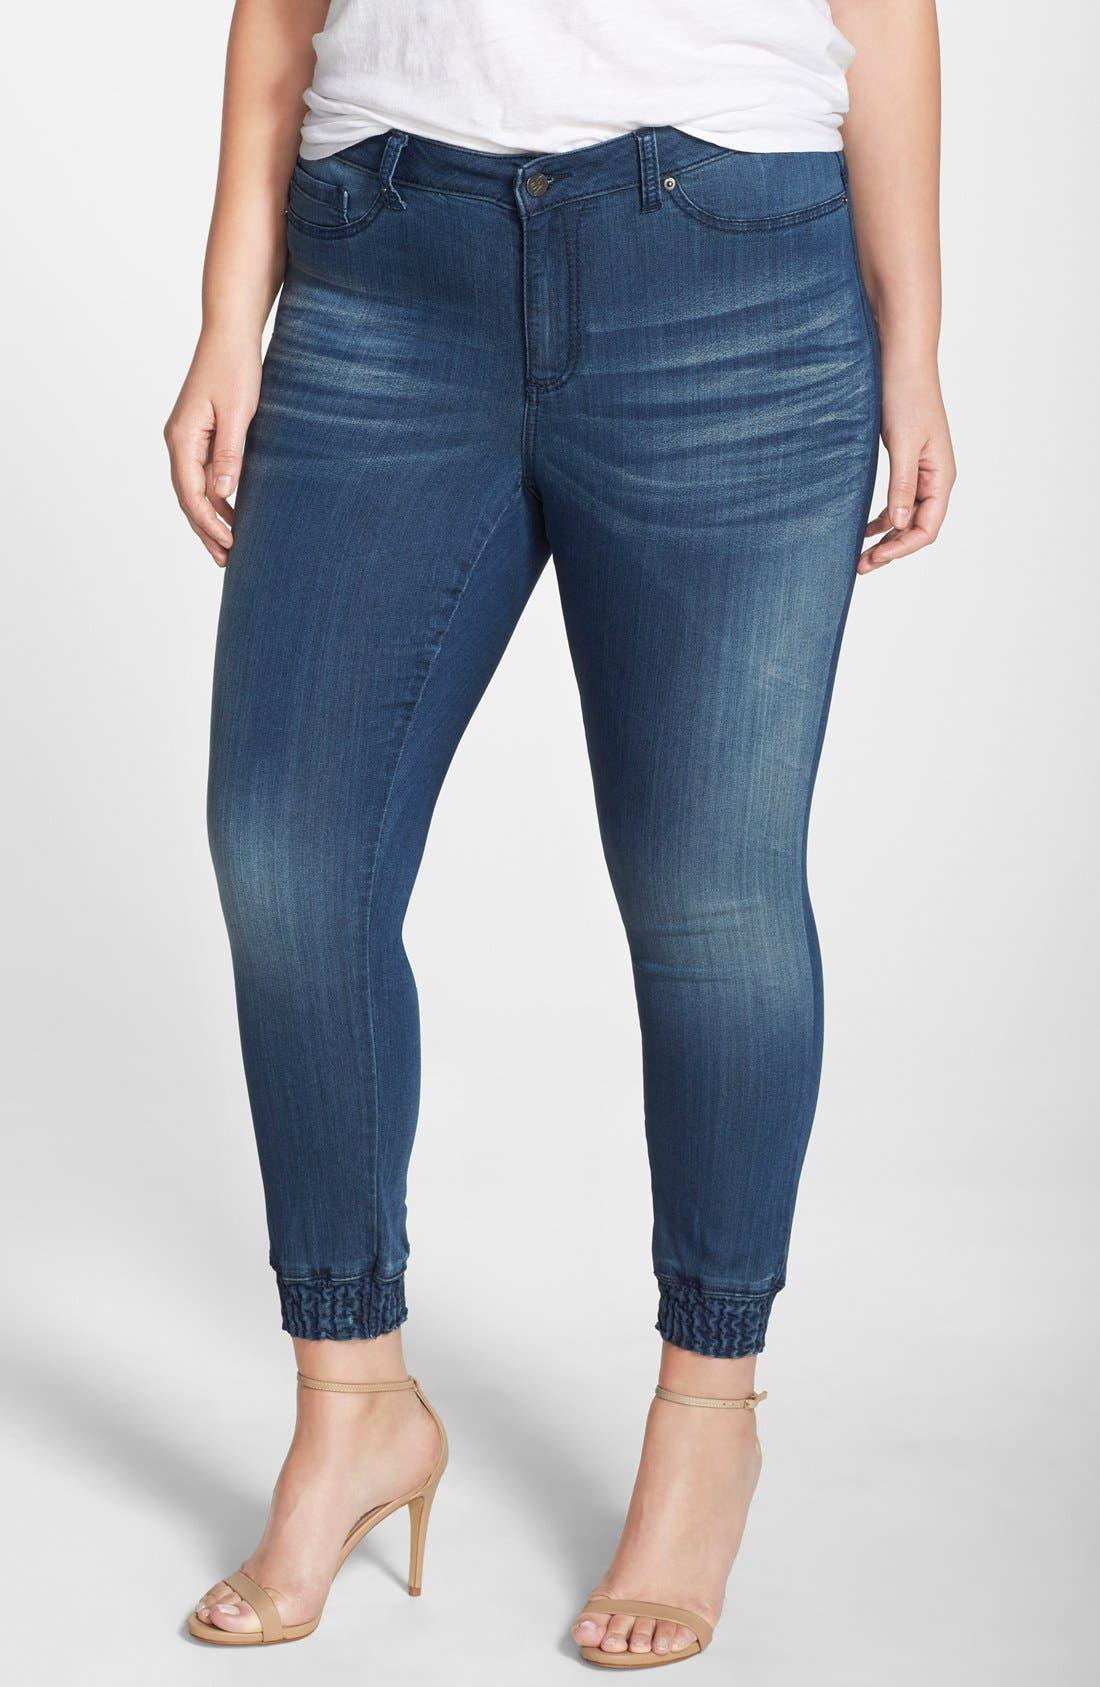 Main Image - Poetic Justice 'Suzzie' Stretch Knit Denim Crop Jeans (Plus Size)